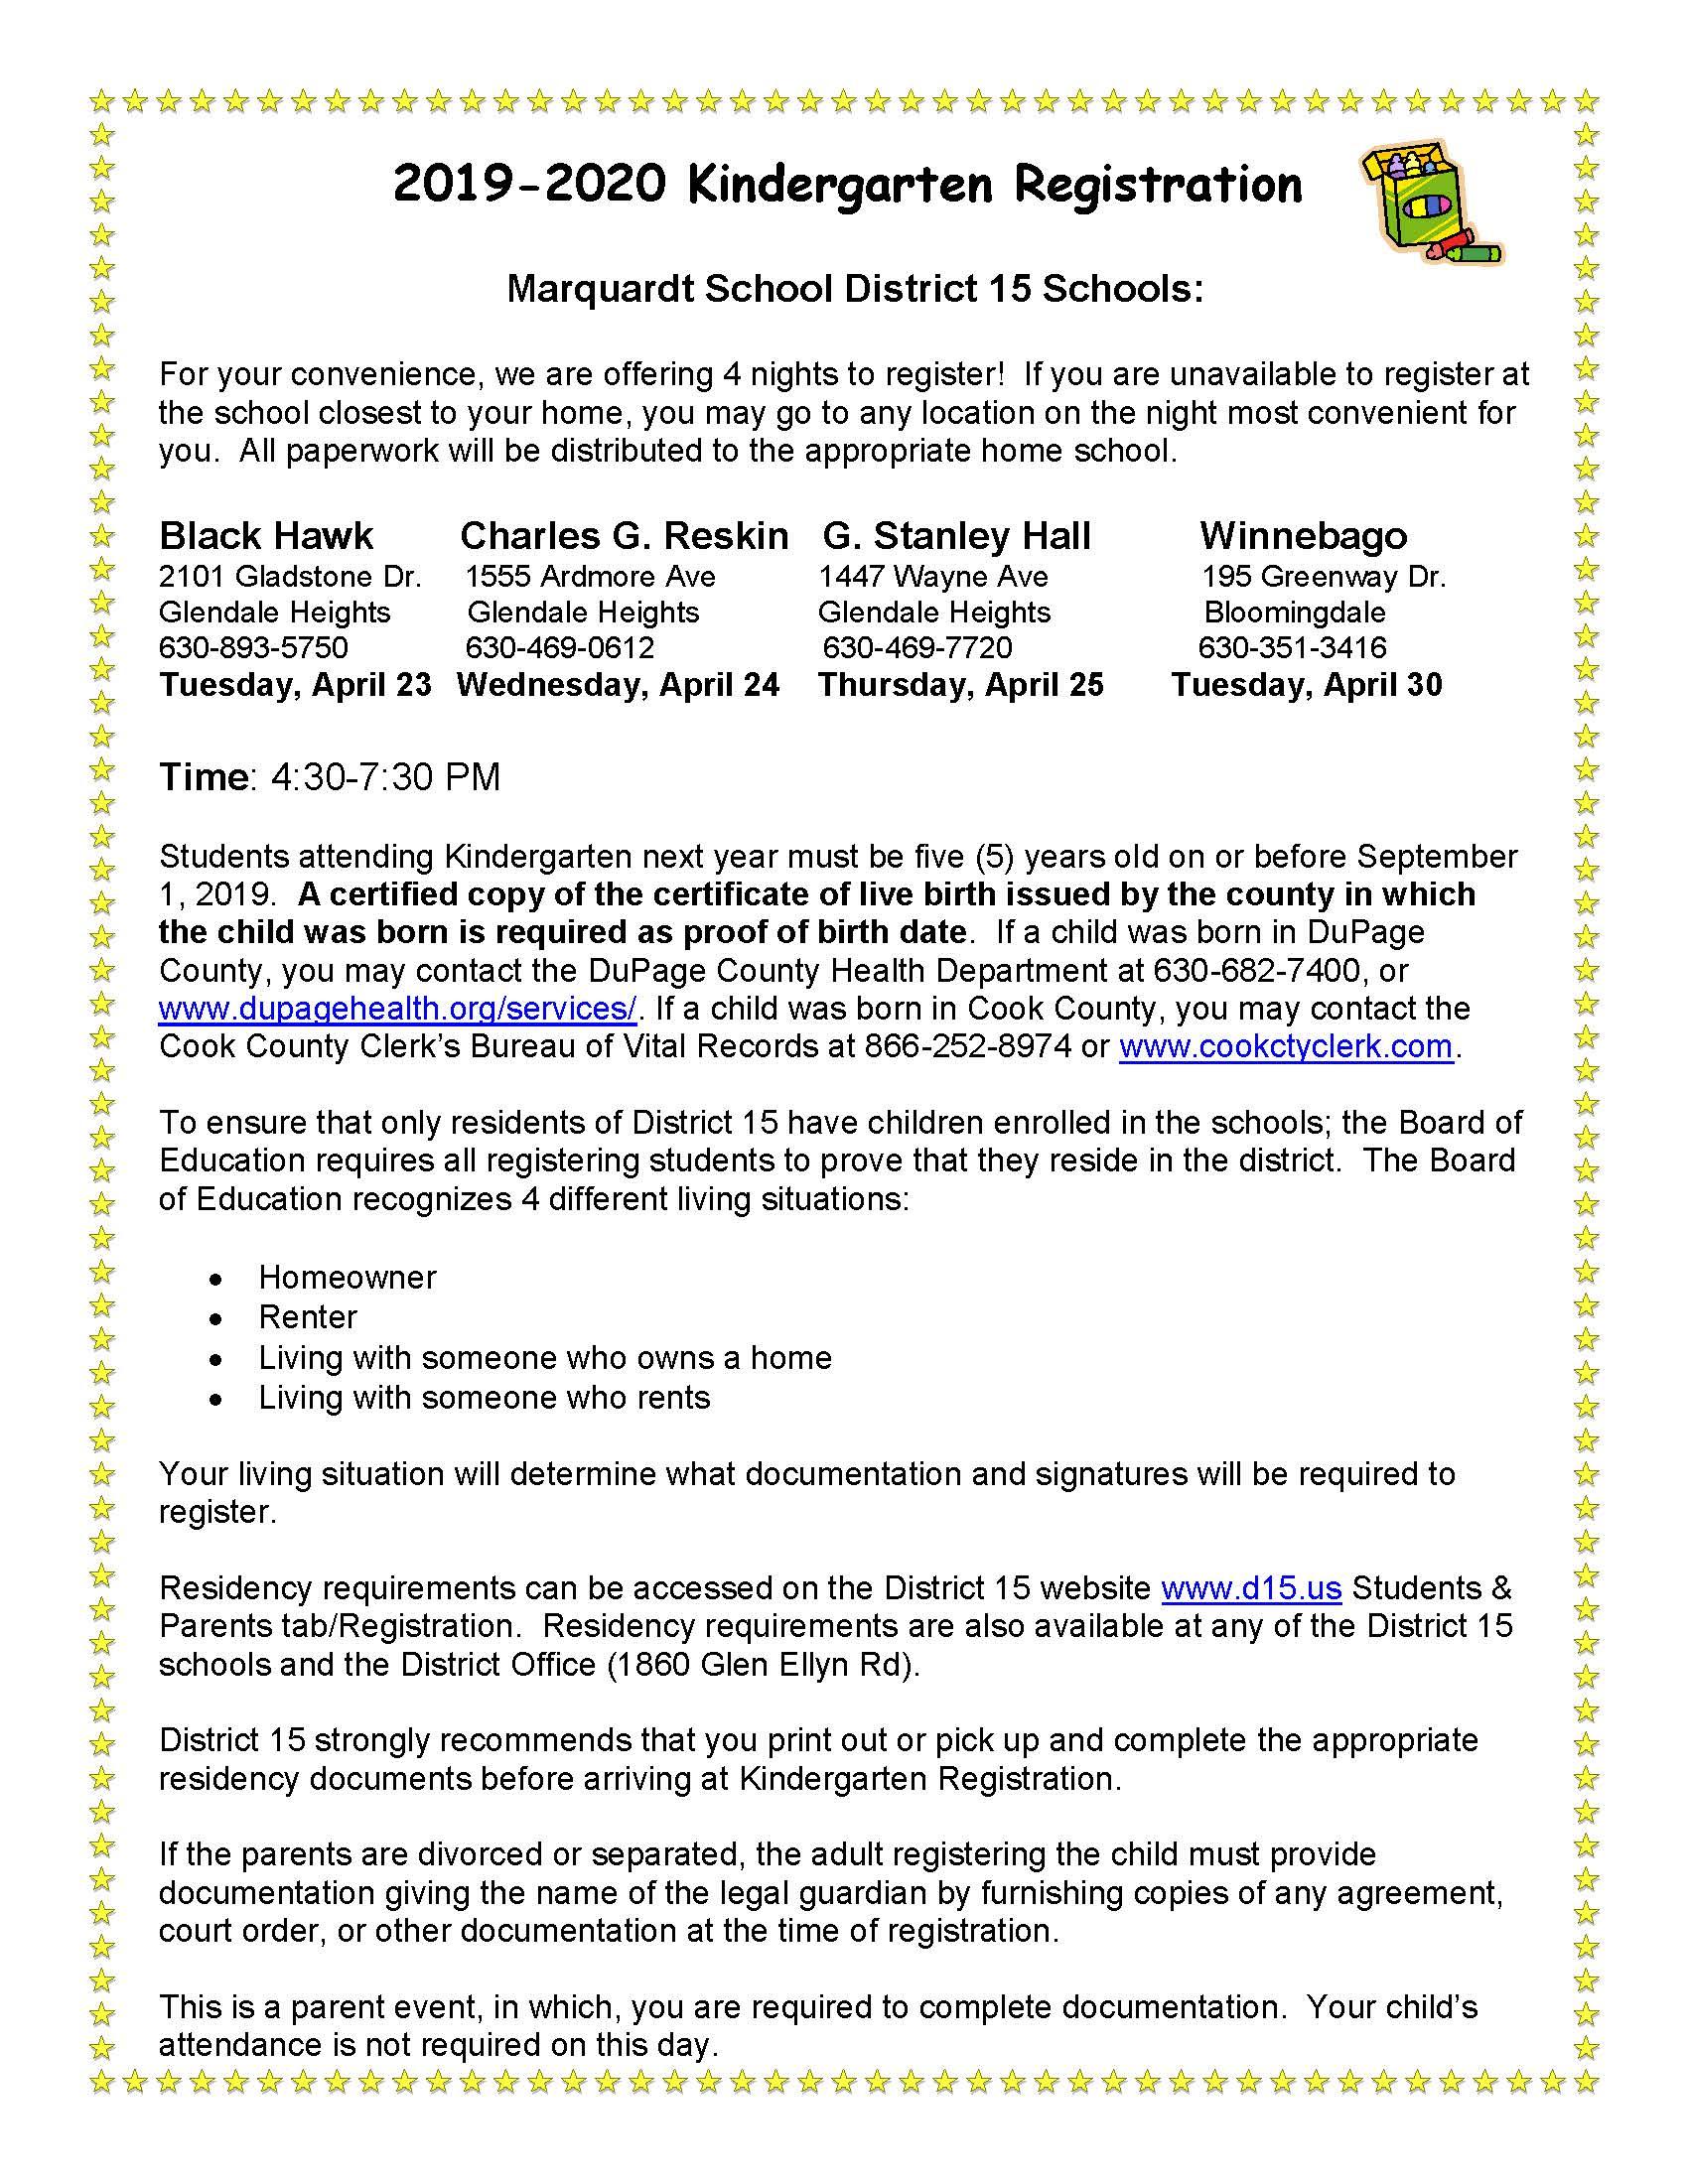 Kindergarten Flyer 2019-2020_Page_1.png